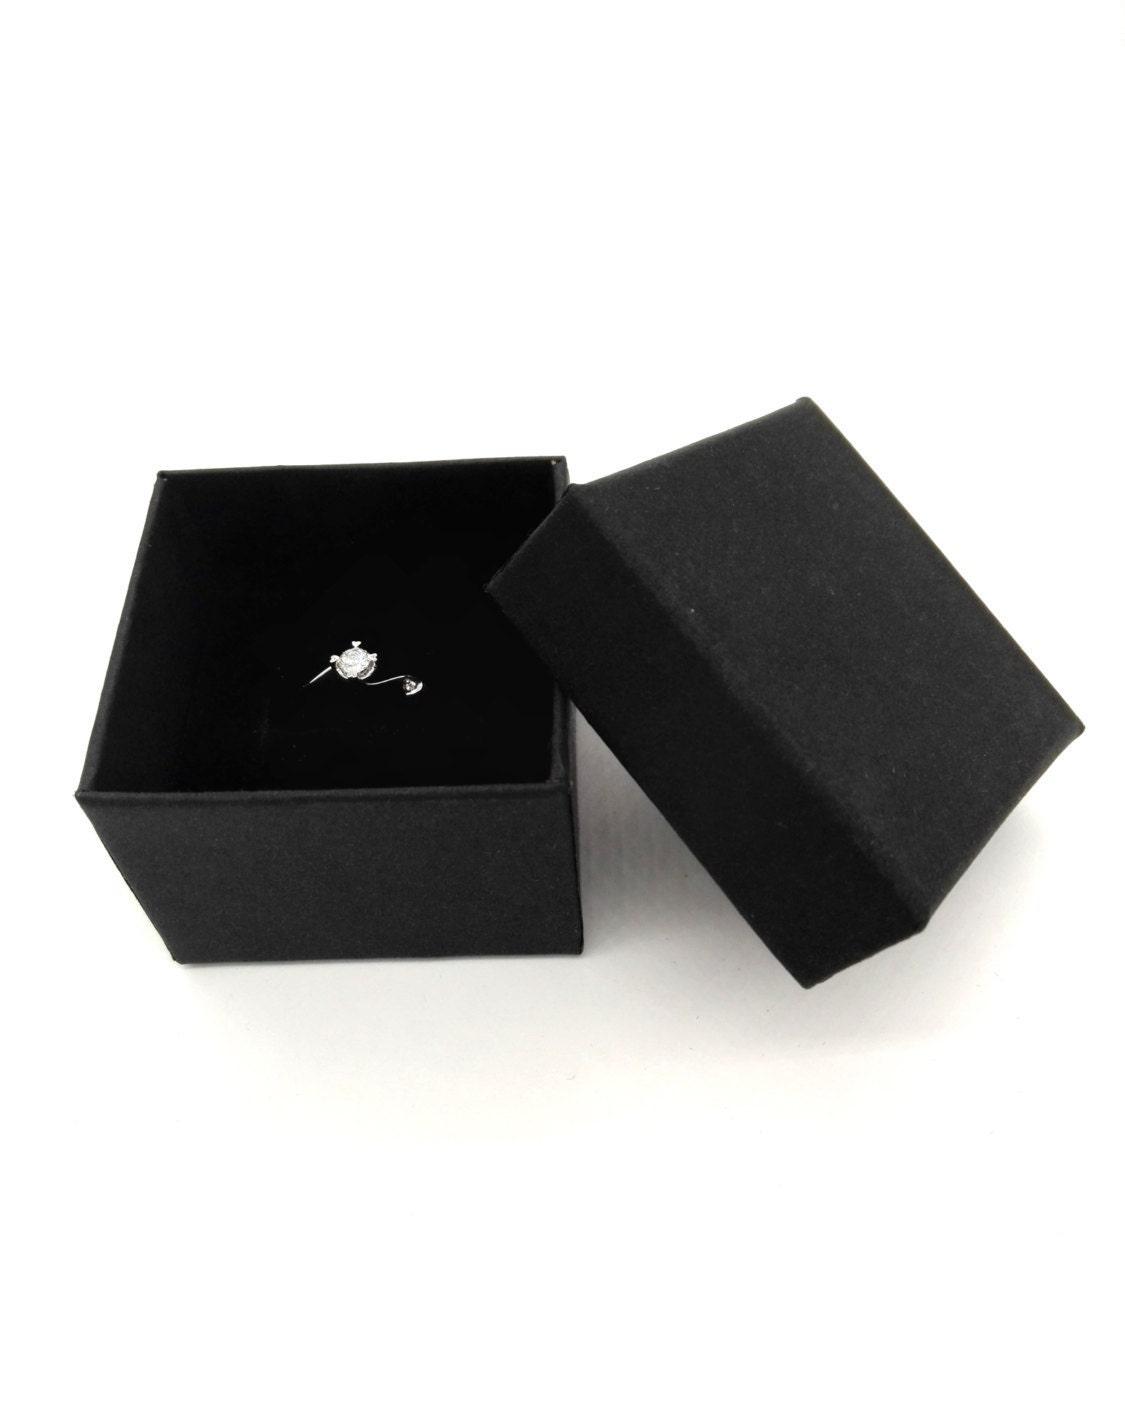 Jewelry box rings boxes black box 50pcs kraft jewelry for Black box container studios